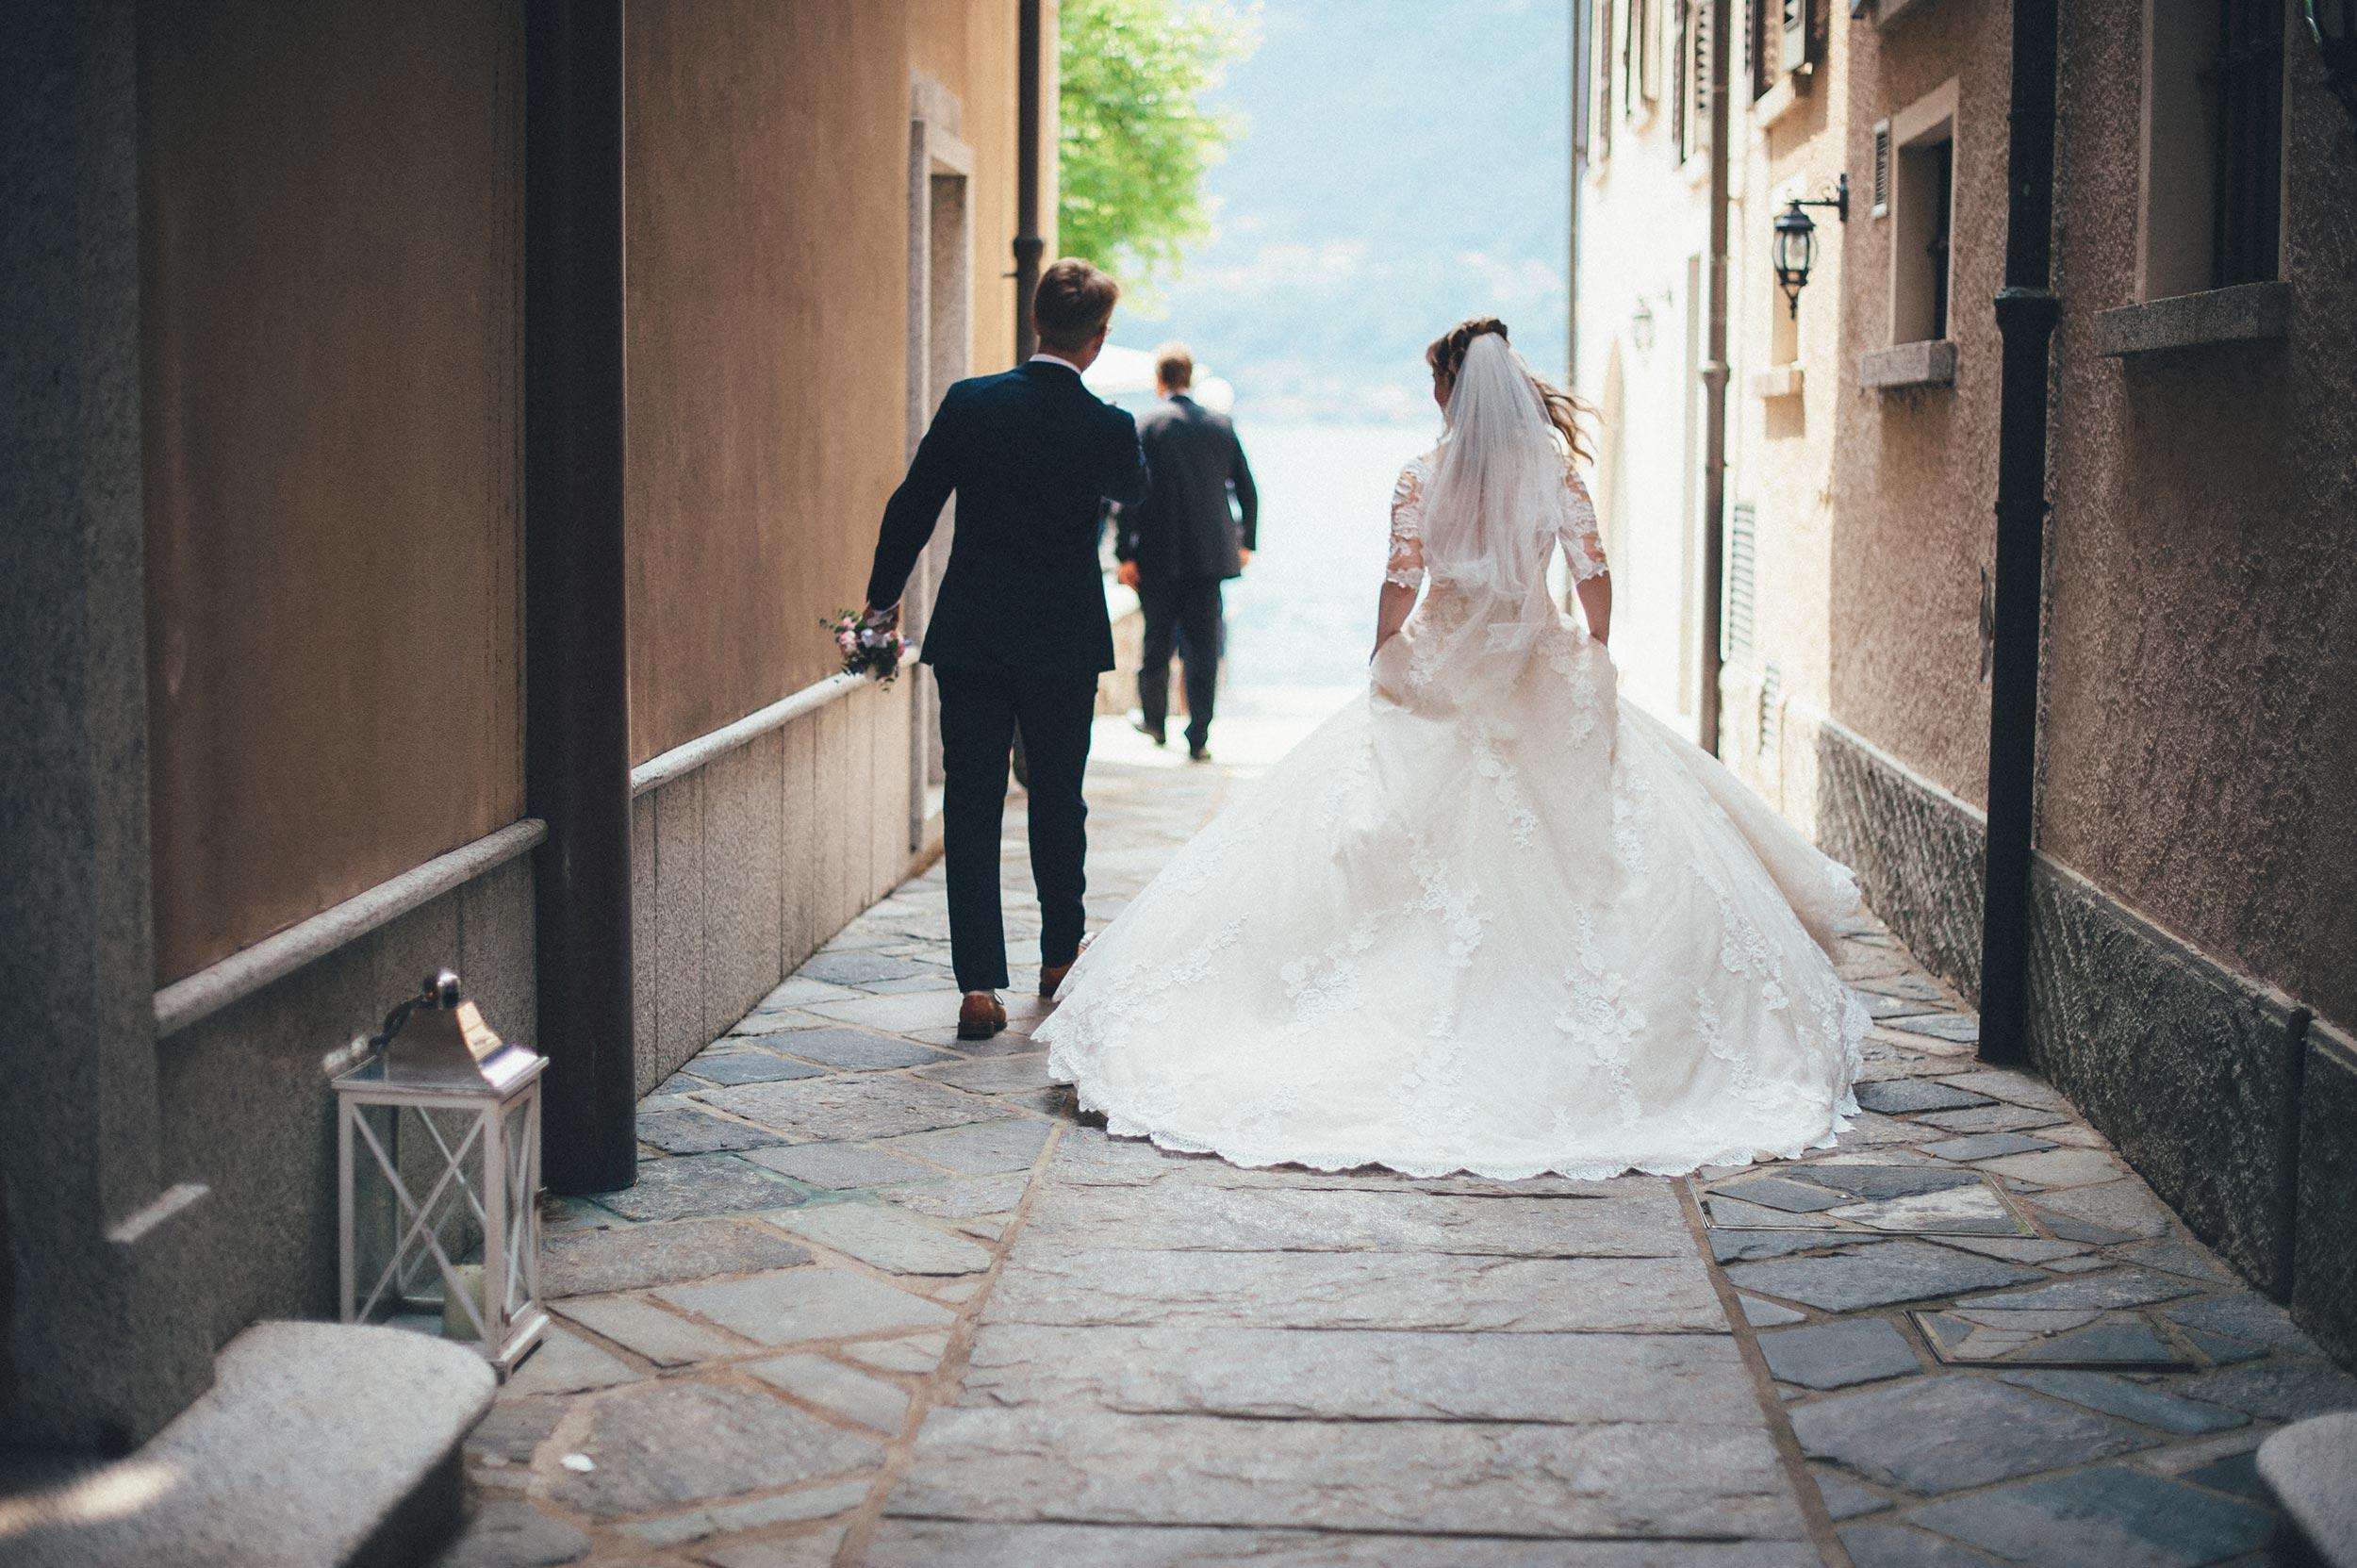 2016-Julius-Silke-Lake-Orta-Wedding-Photographer-Italy-Alessandro-Avenali-60.jpg